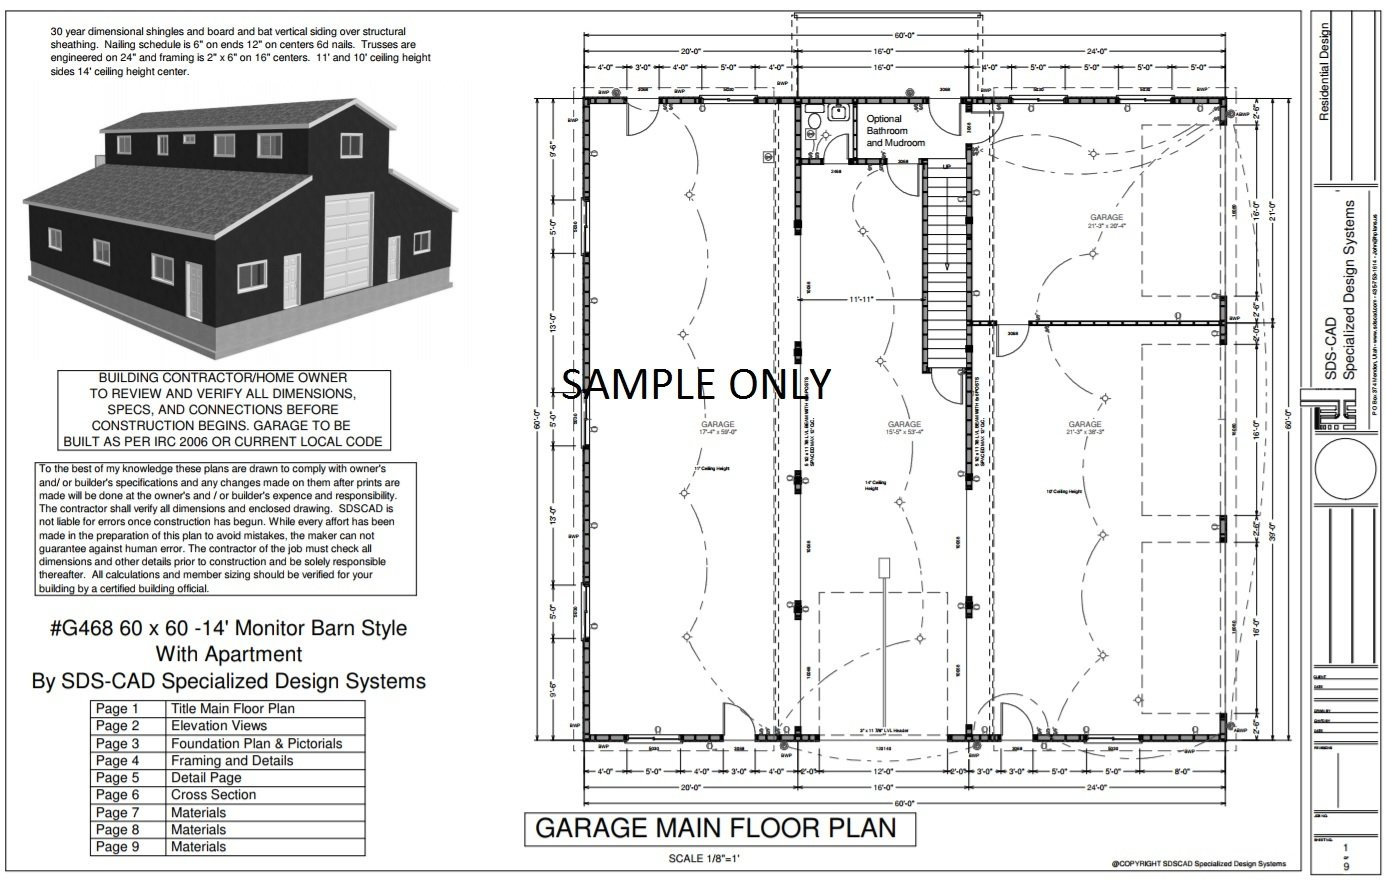 Rv garage sds plans for Monitor garage plans